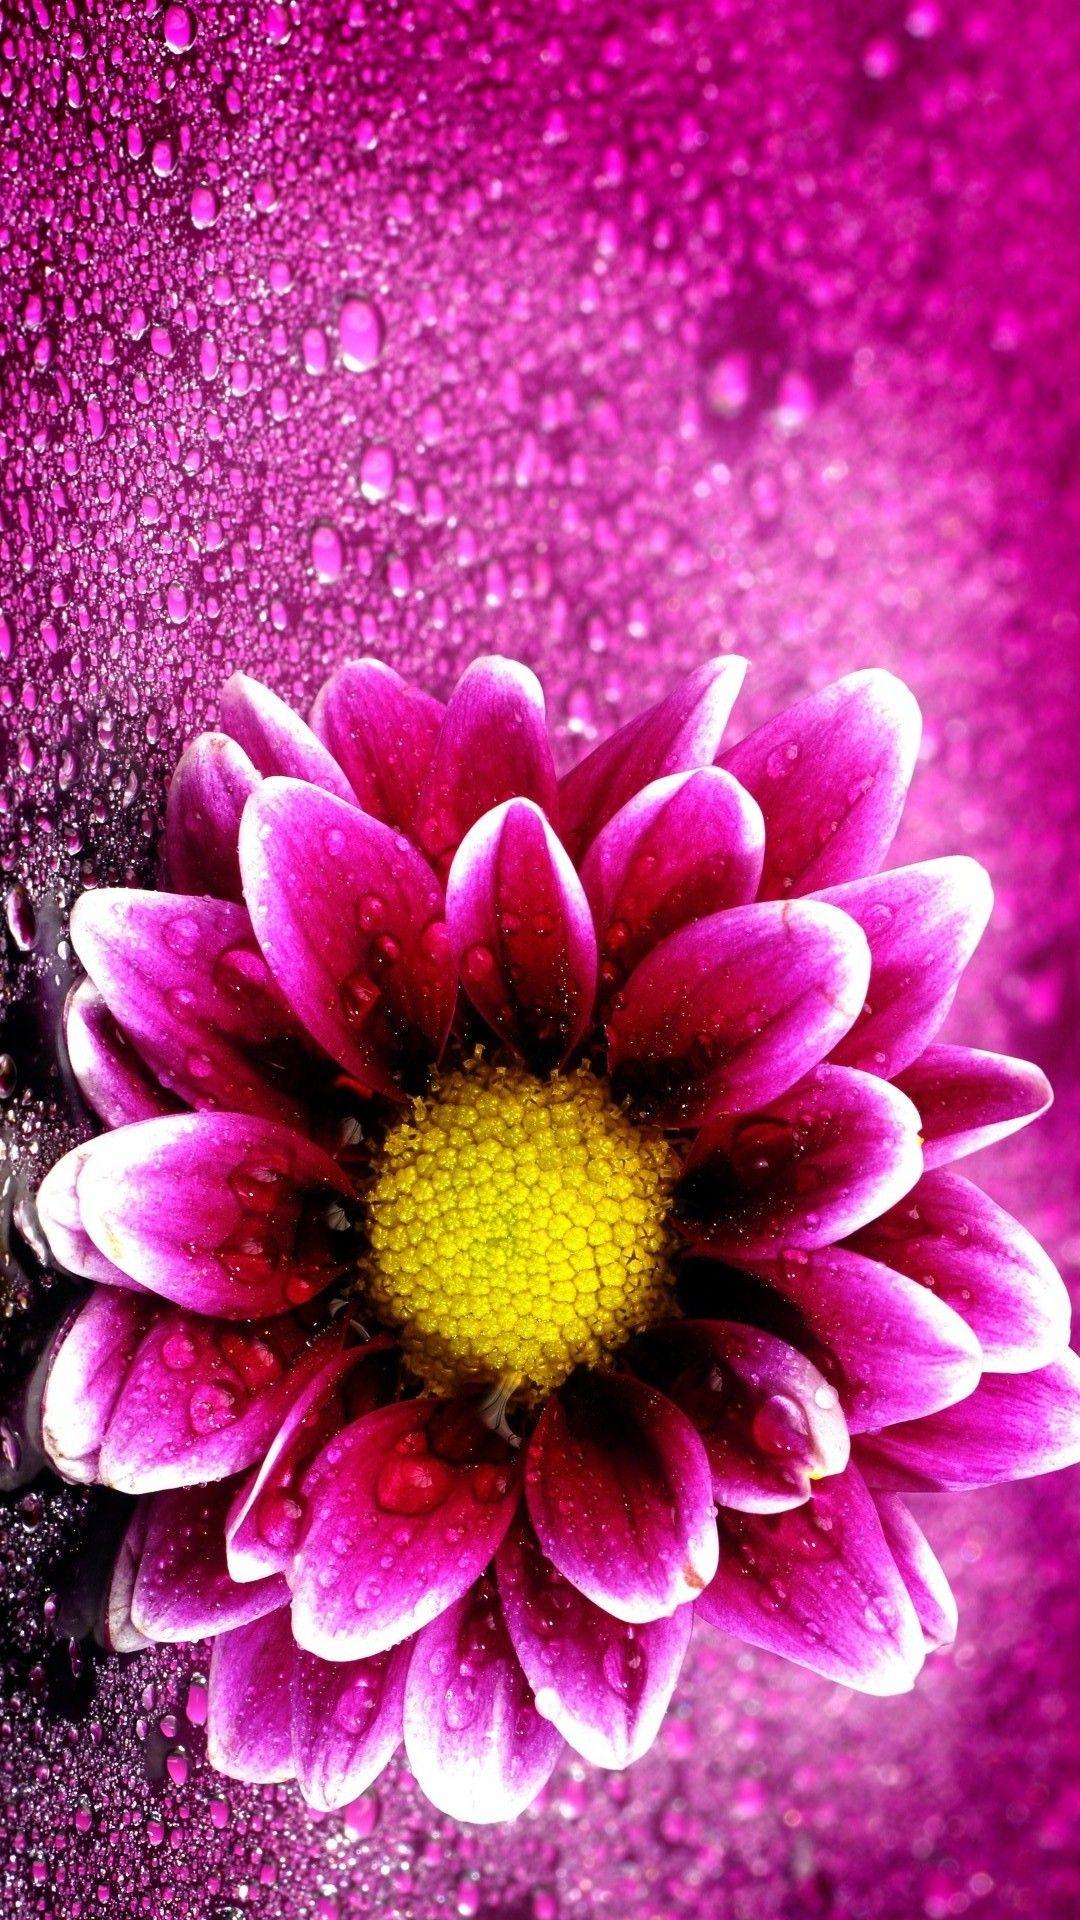 Pink Flower Wallpaper iPhone Best iPhone Wallpaper